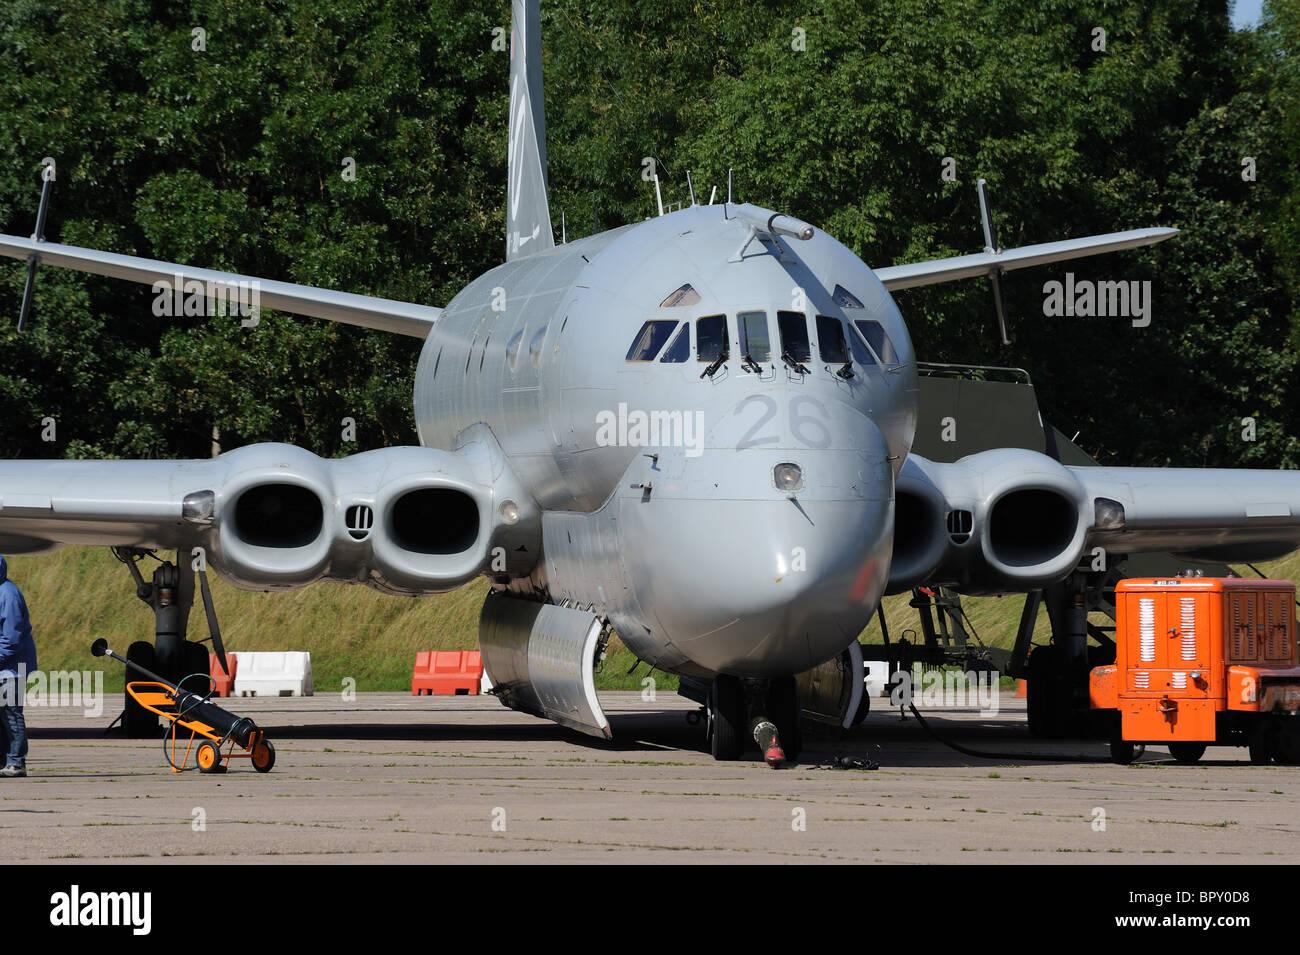 Nimrod MR2 maritime patrol aircraft - Stock Image